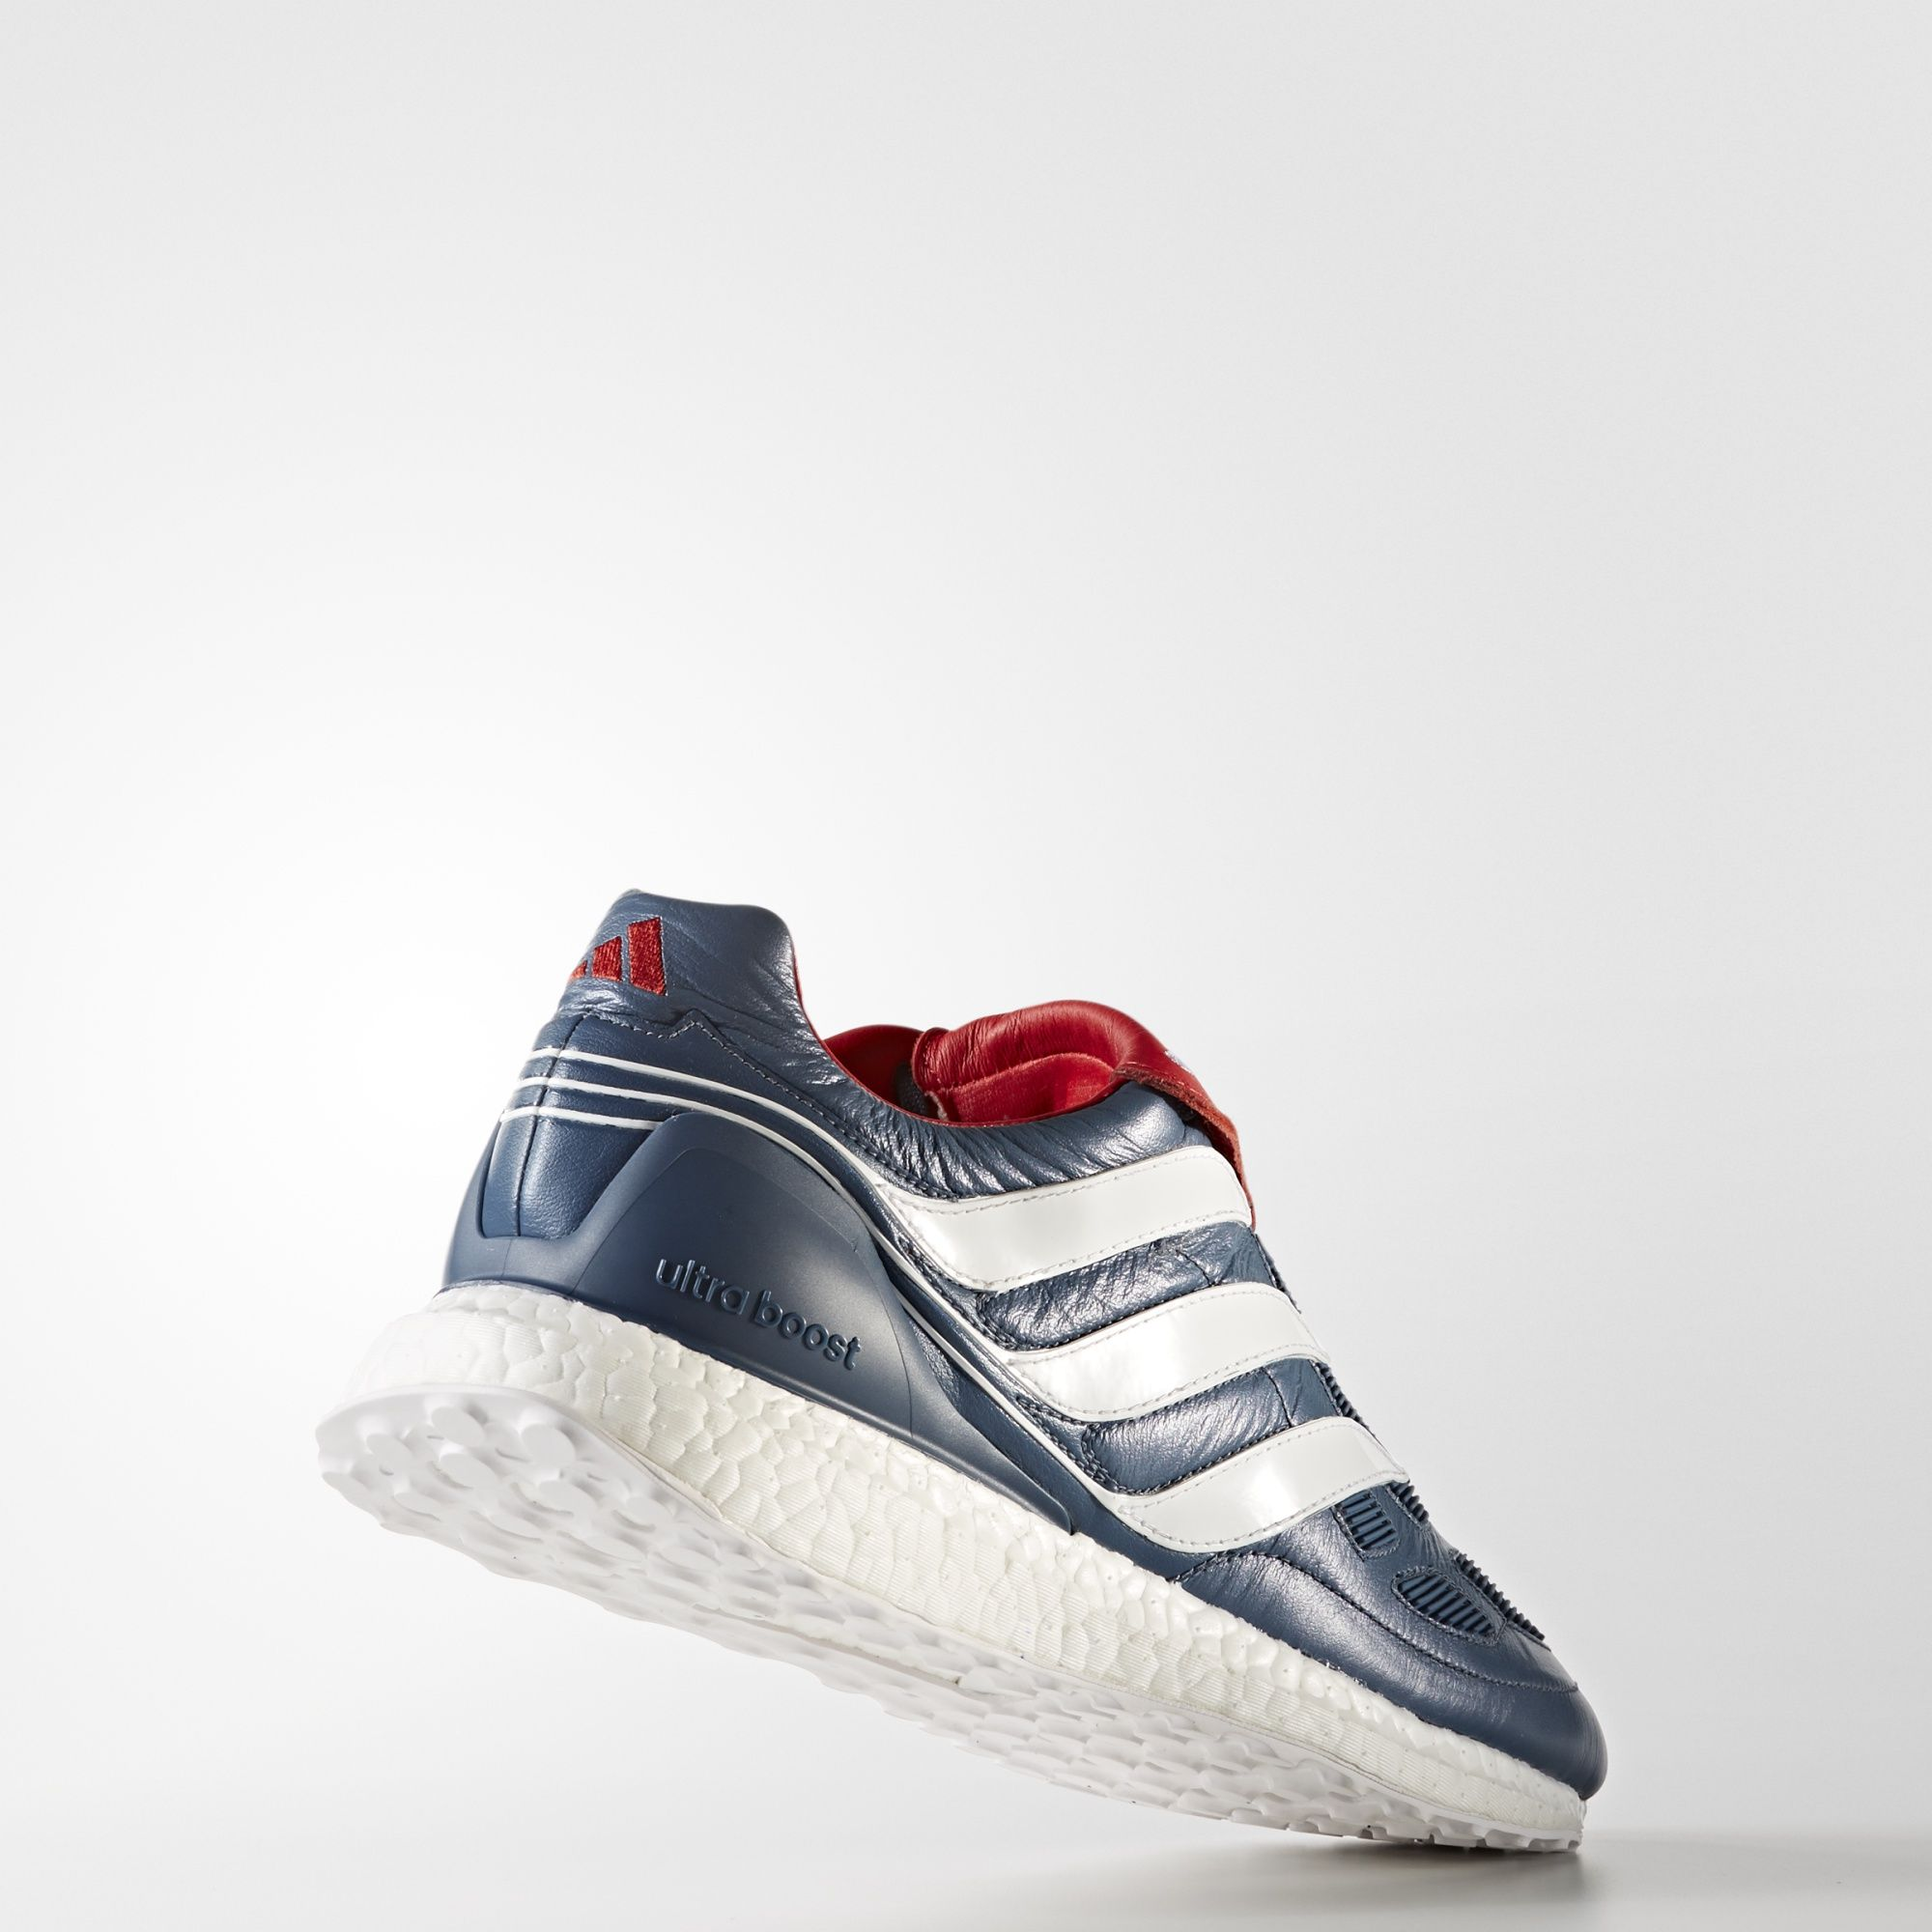 905590aec adidas predator precision ultraboost 4 - WearTesters